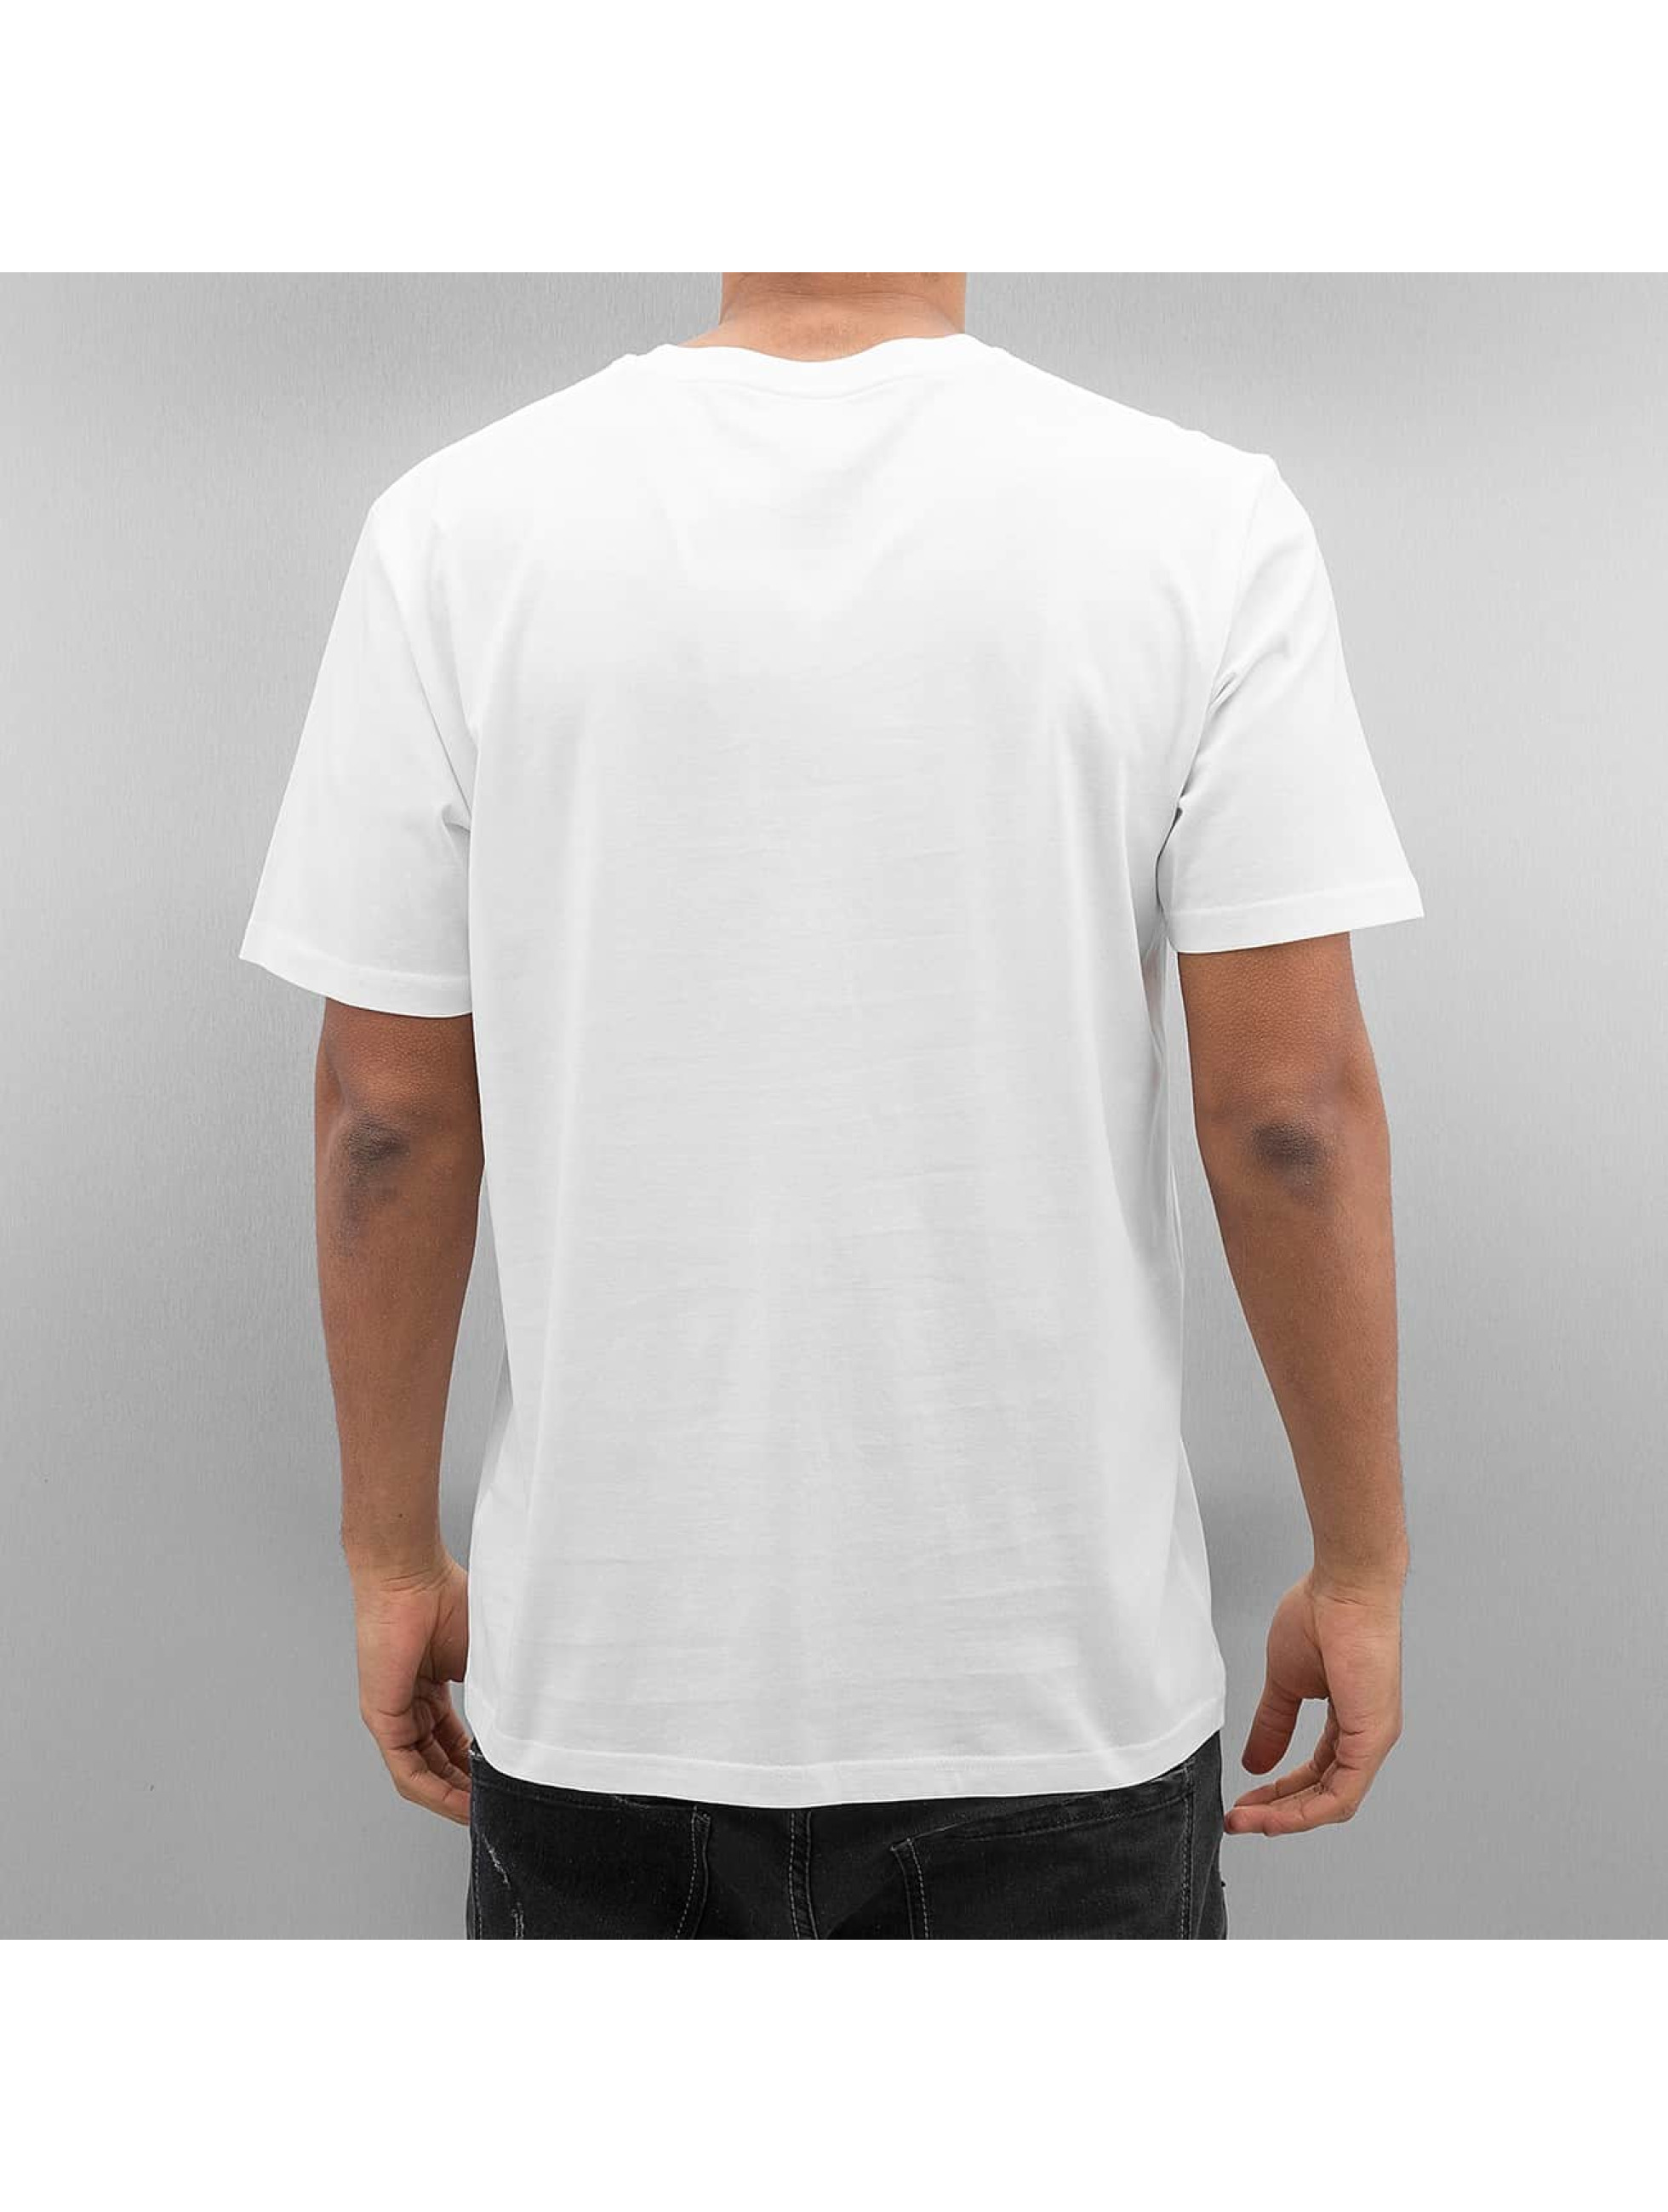 Carhartt WIP T-Shirt S/S Vintage white